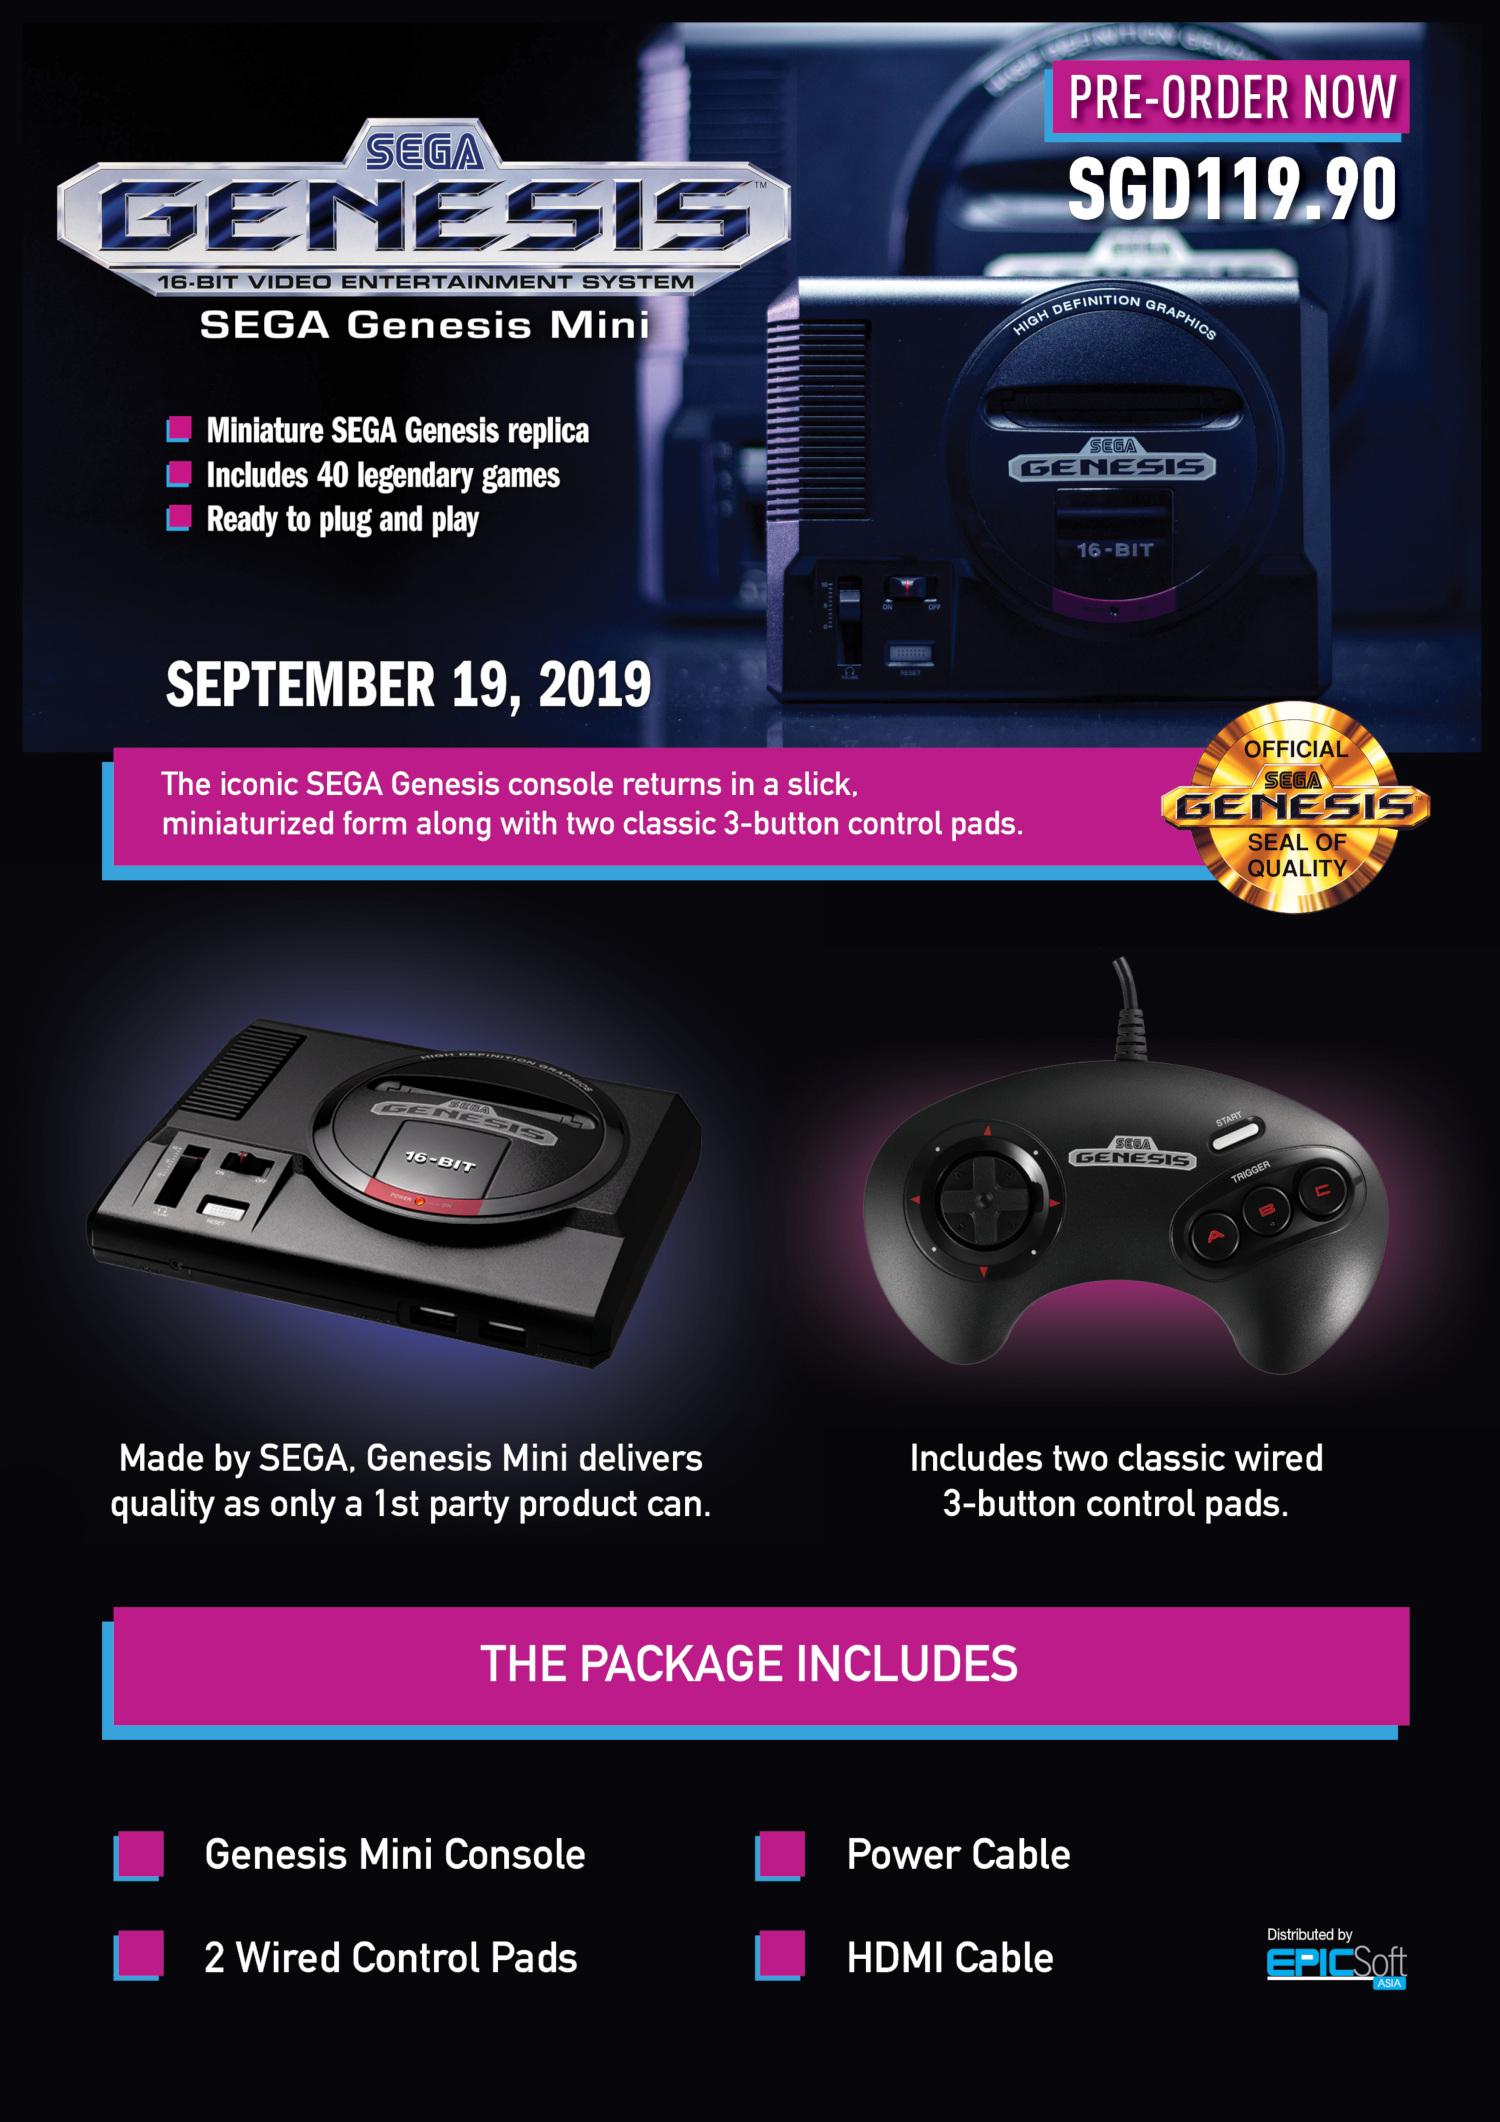 Sega genesis, The Sega Genesis returns with a new mini console